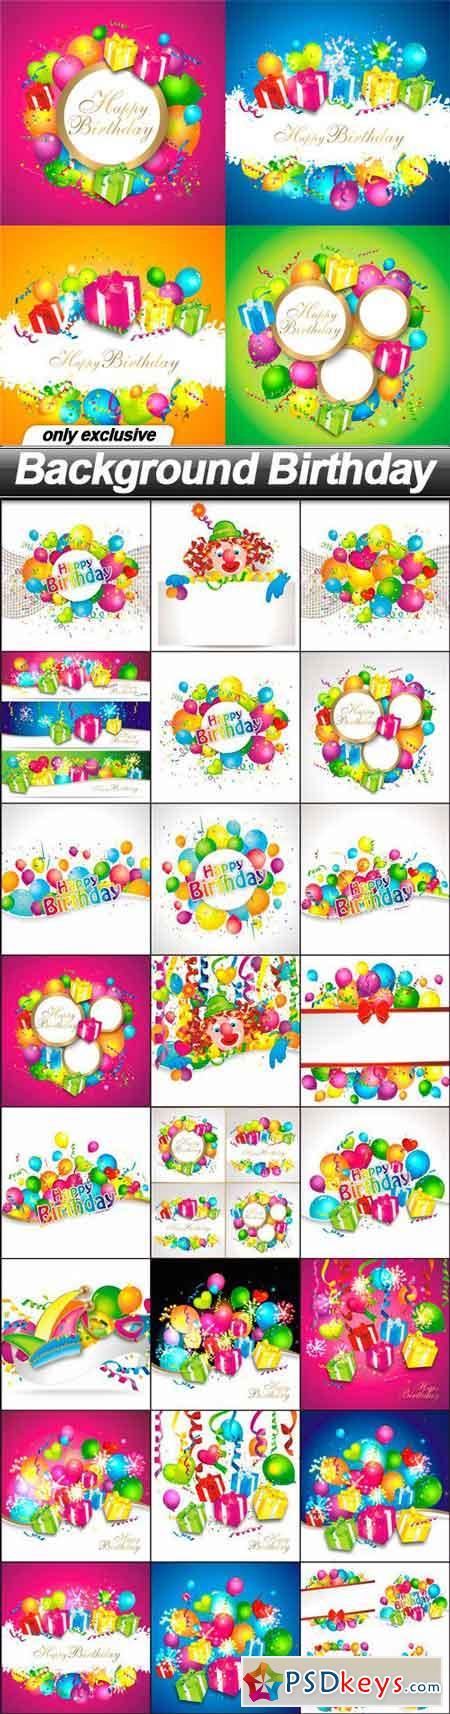 Background Birthday - 25 EPS » Free Download Photoshop